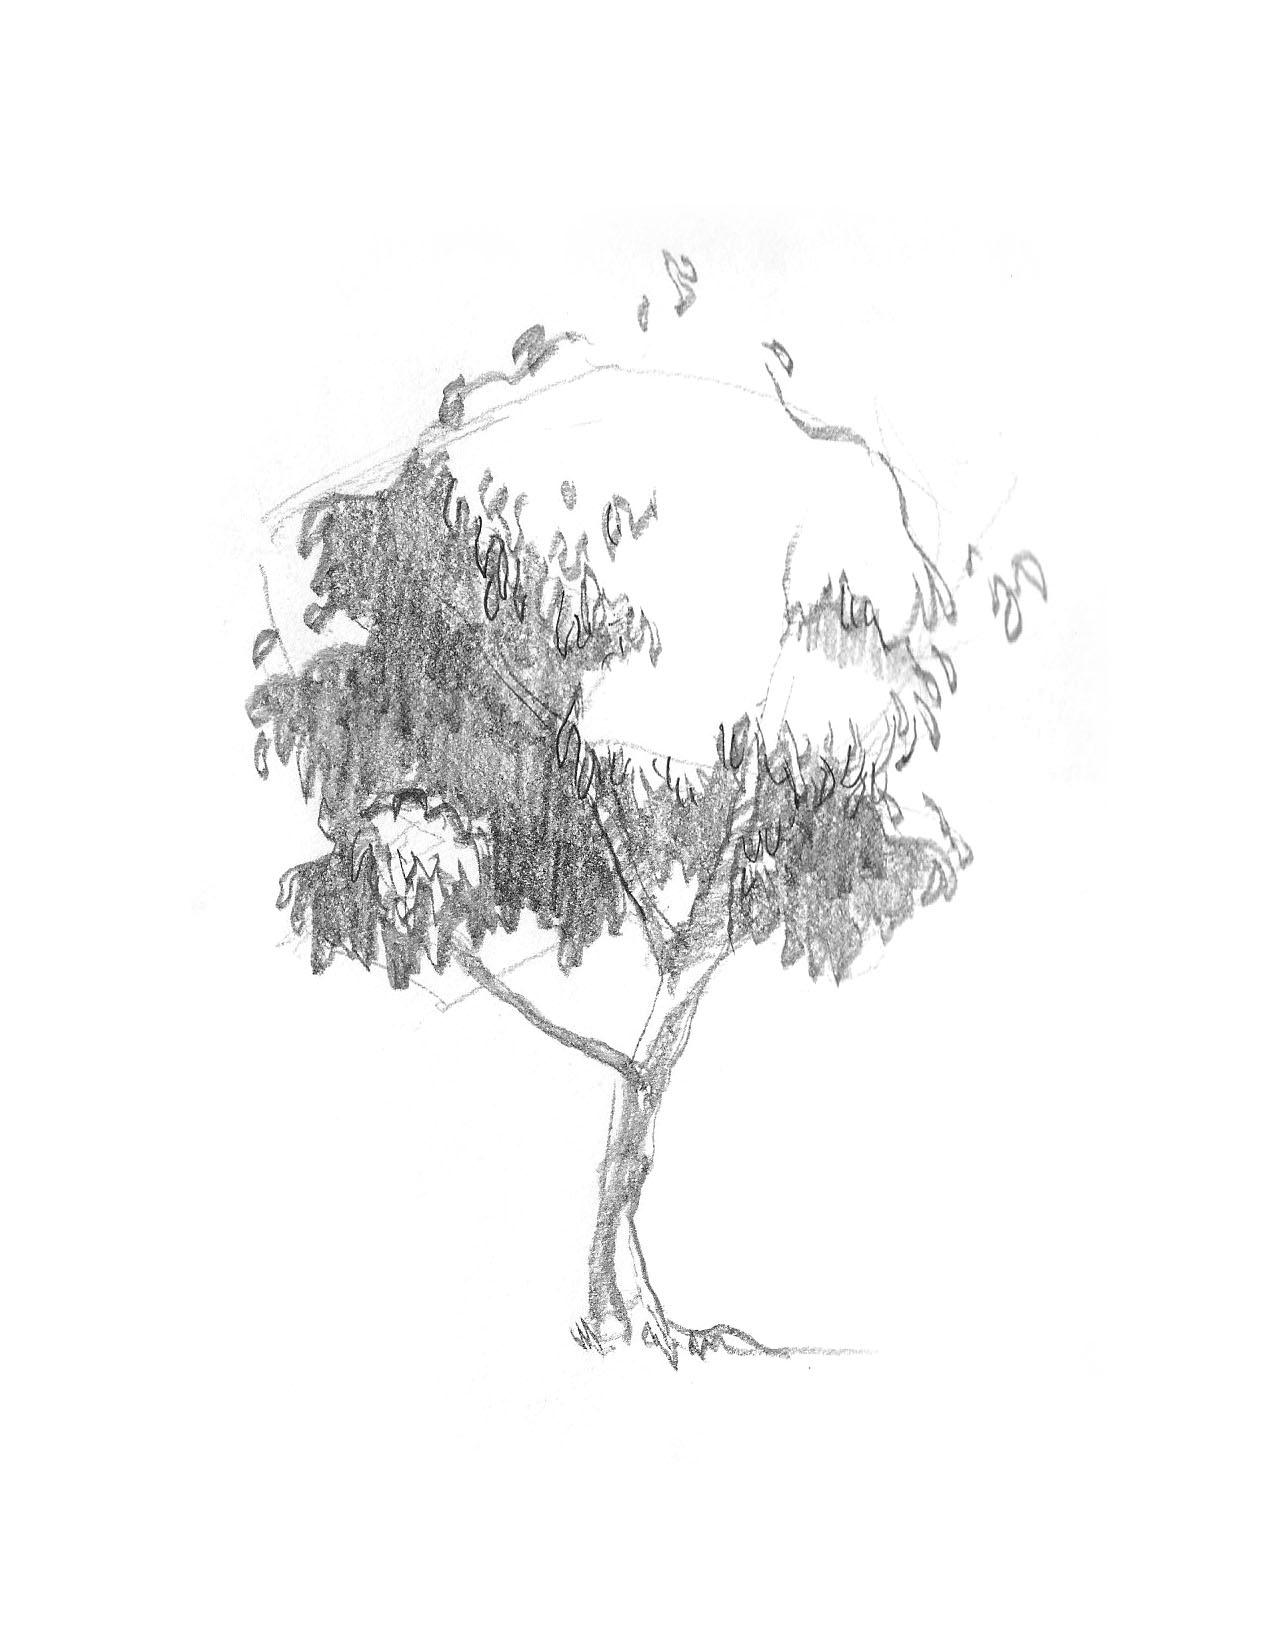 2018-09_Tree 02.jpg